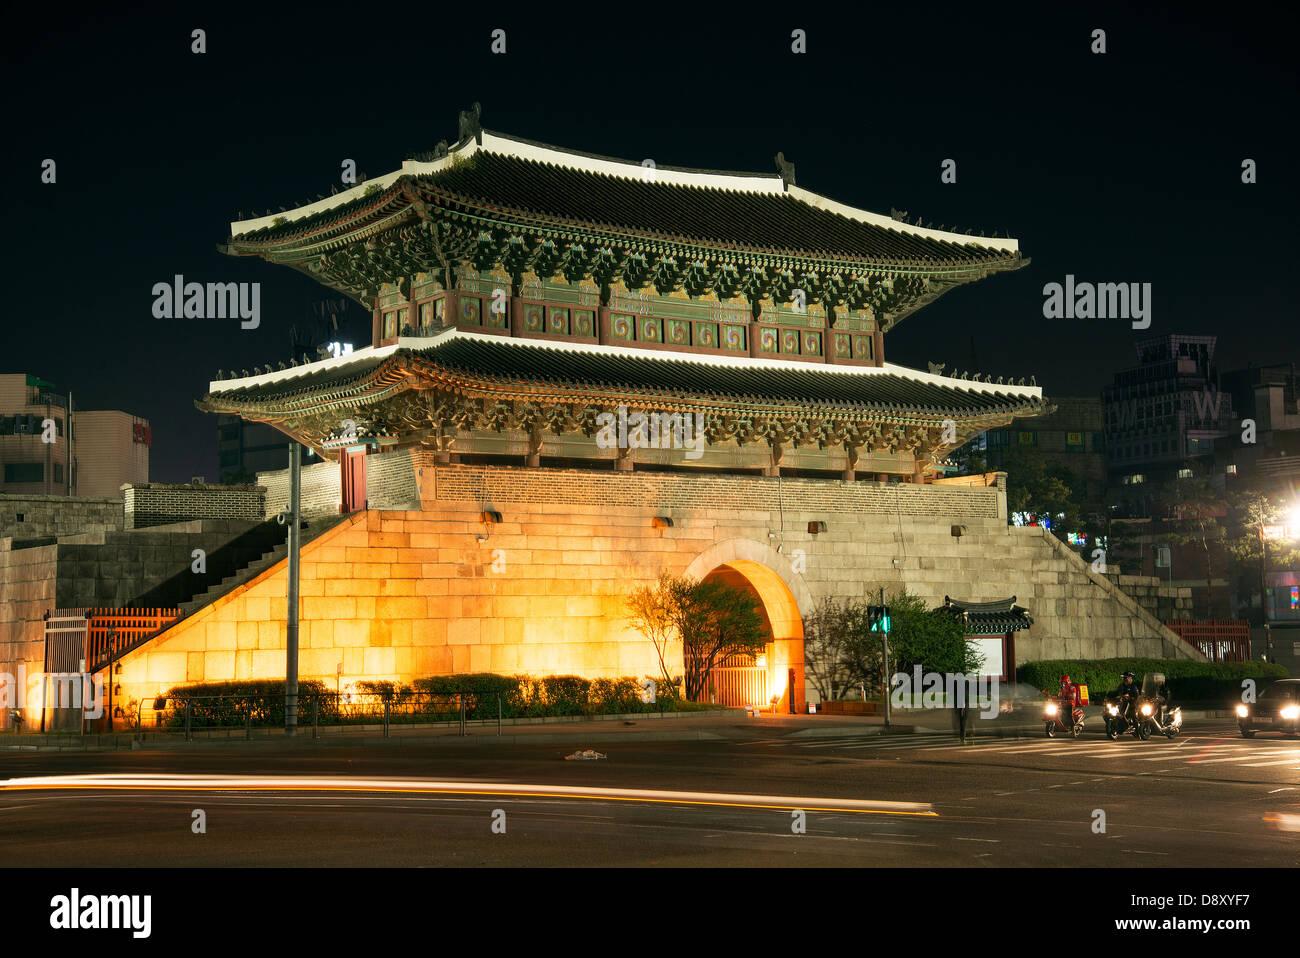 Porta di dongdaemun landmark in Seoul corea del sud di notte Immagini Stock